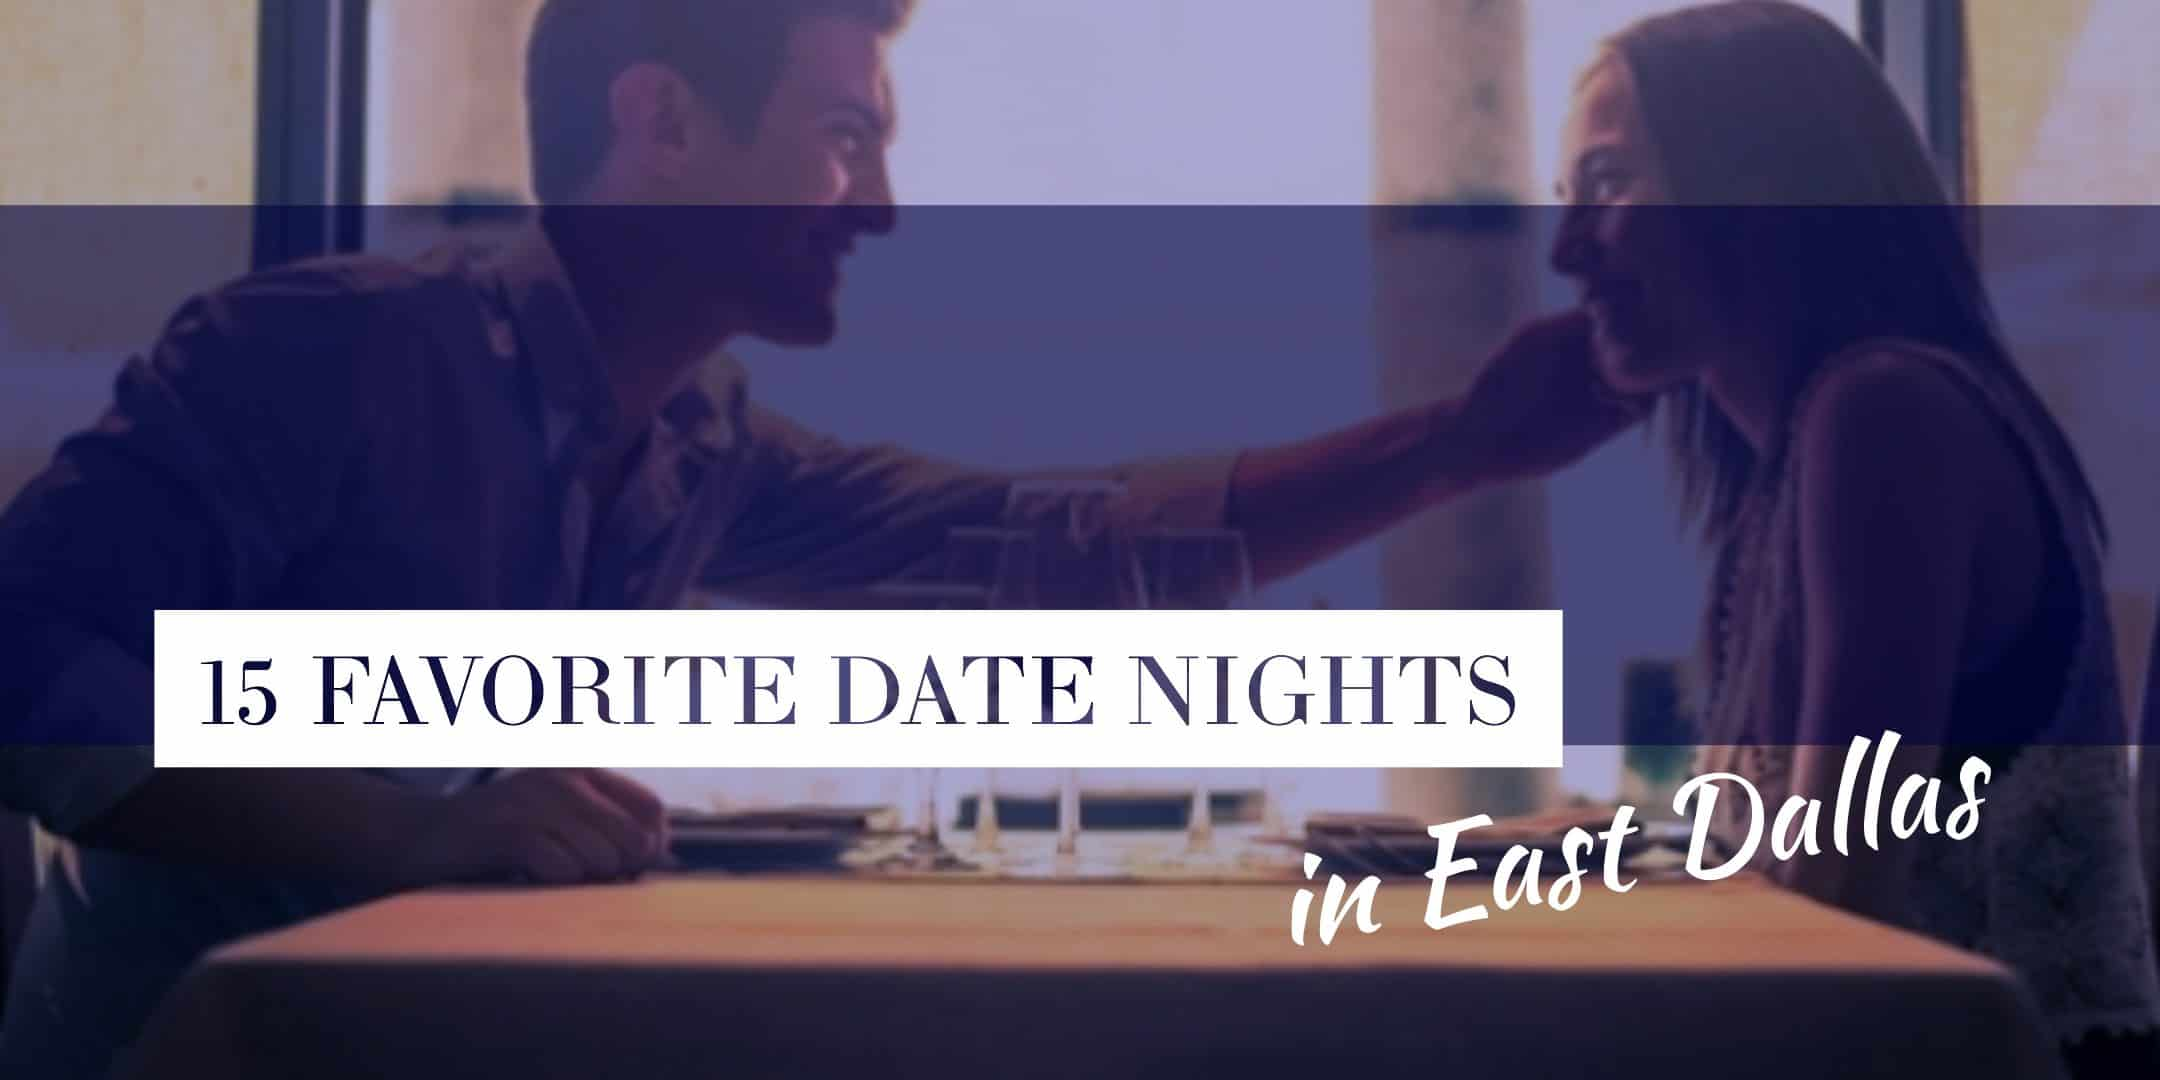 15 Favorite Date Nights in East Dallas